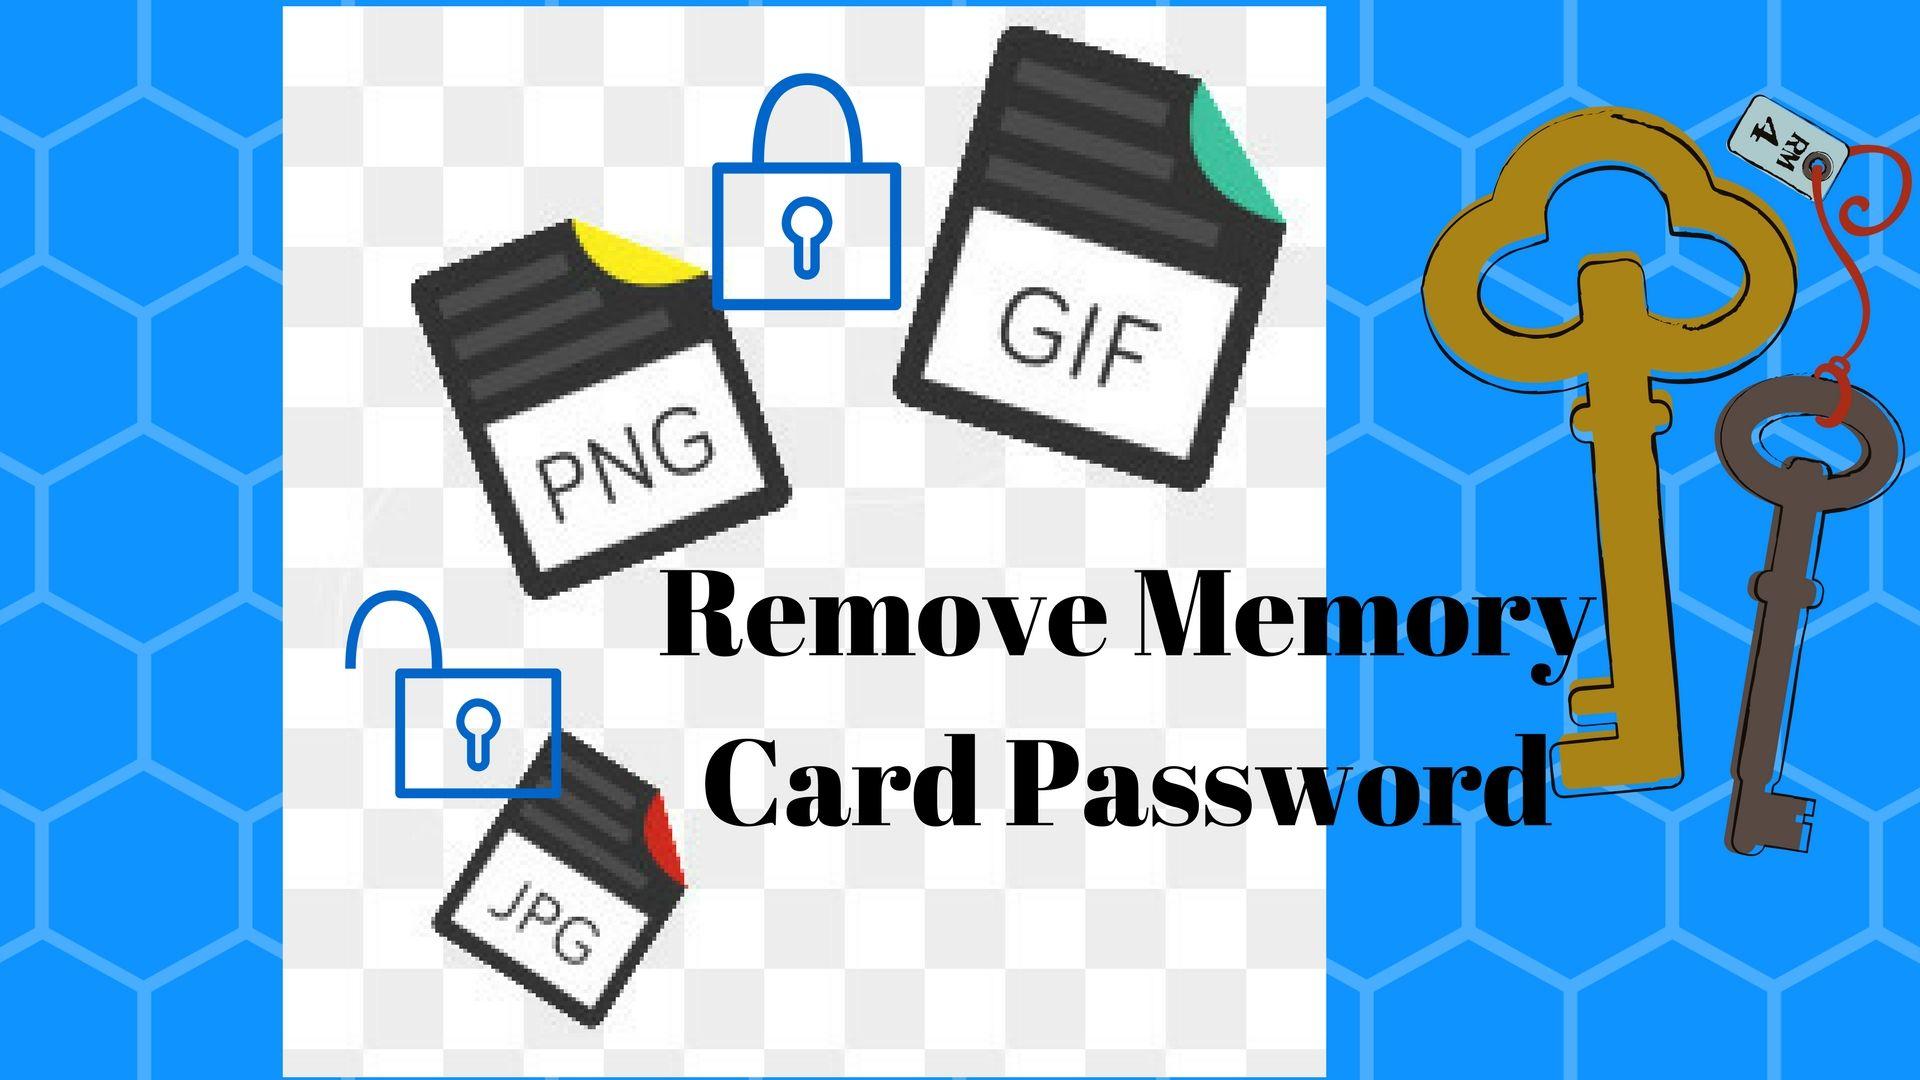 Remove Memory Card Password